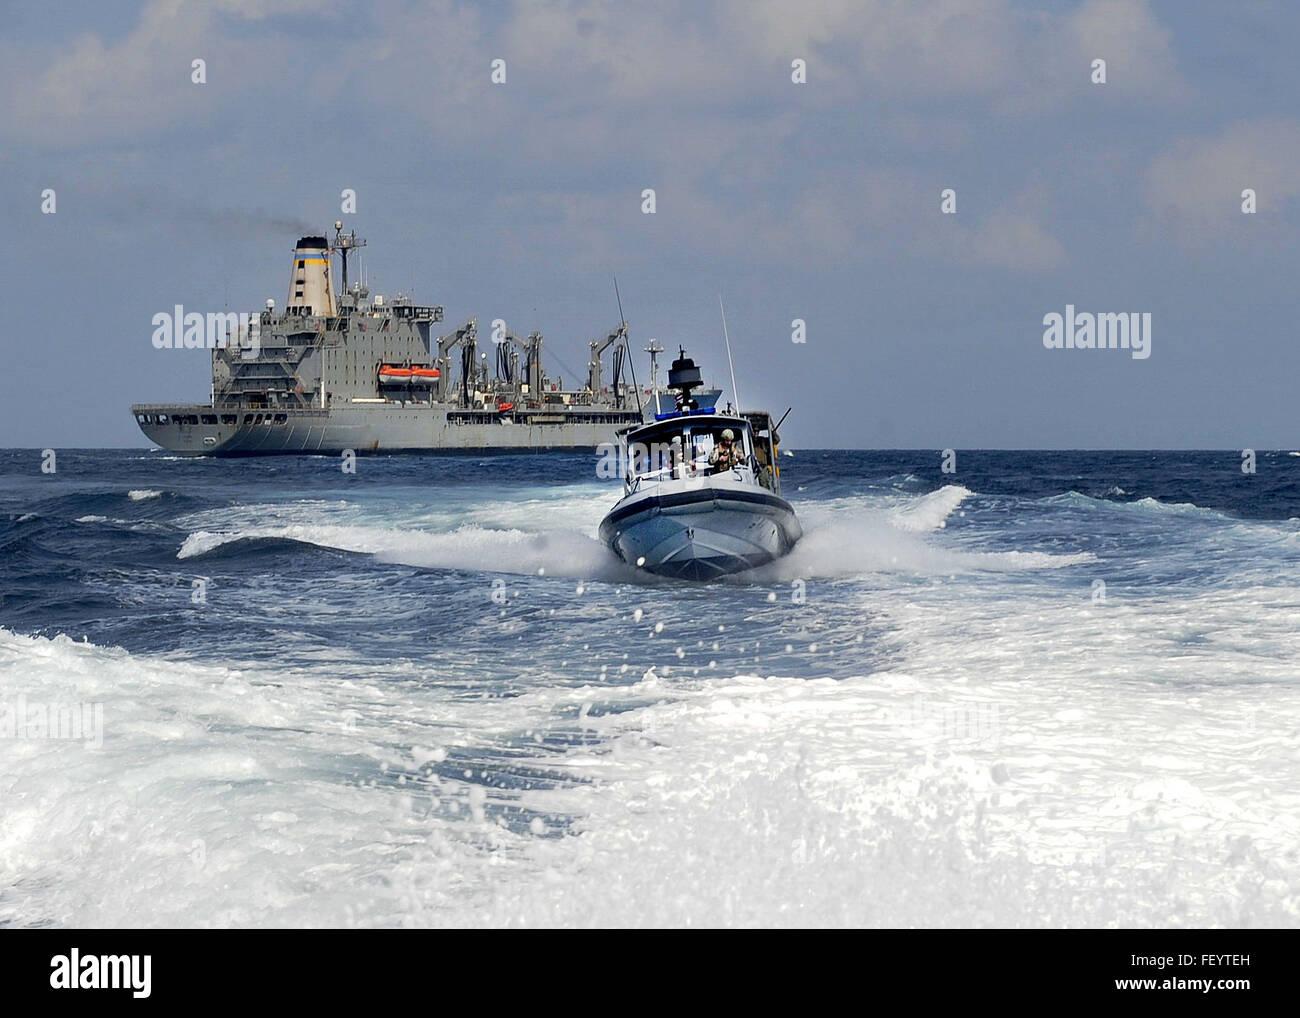 DJIBOUTI (Jan. 9, 2016) Coastal Riverine Squadron (CRS) 10, forward deployed to Camp Lemonnier, Djibouti, Africa, - Stock Image